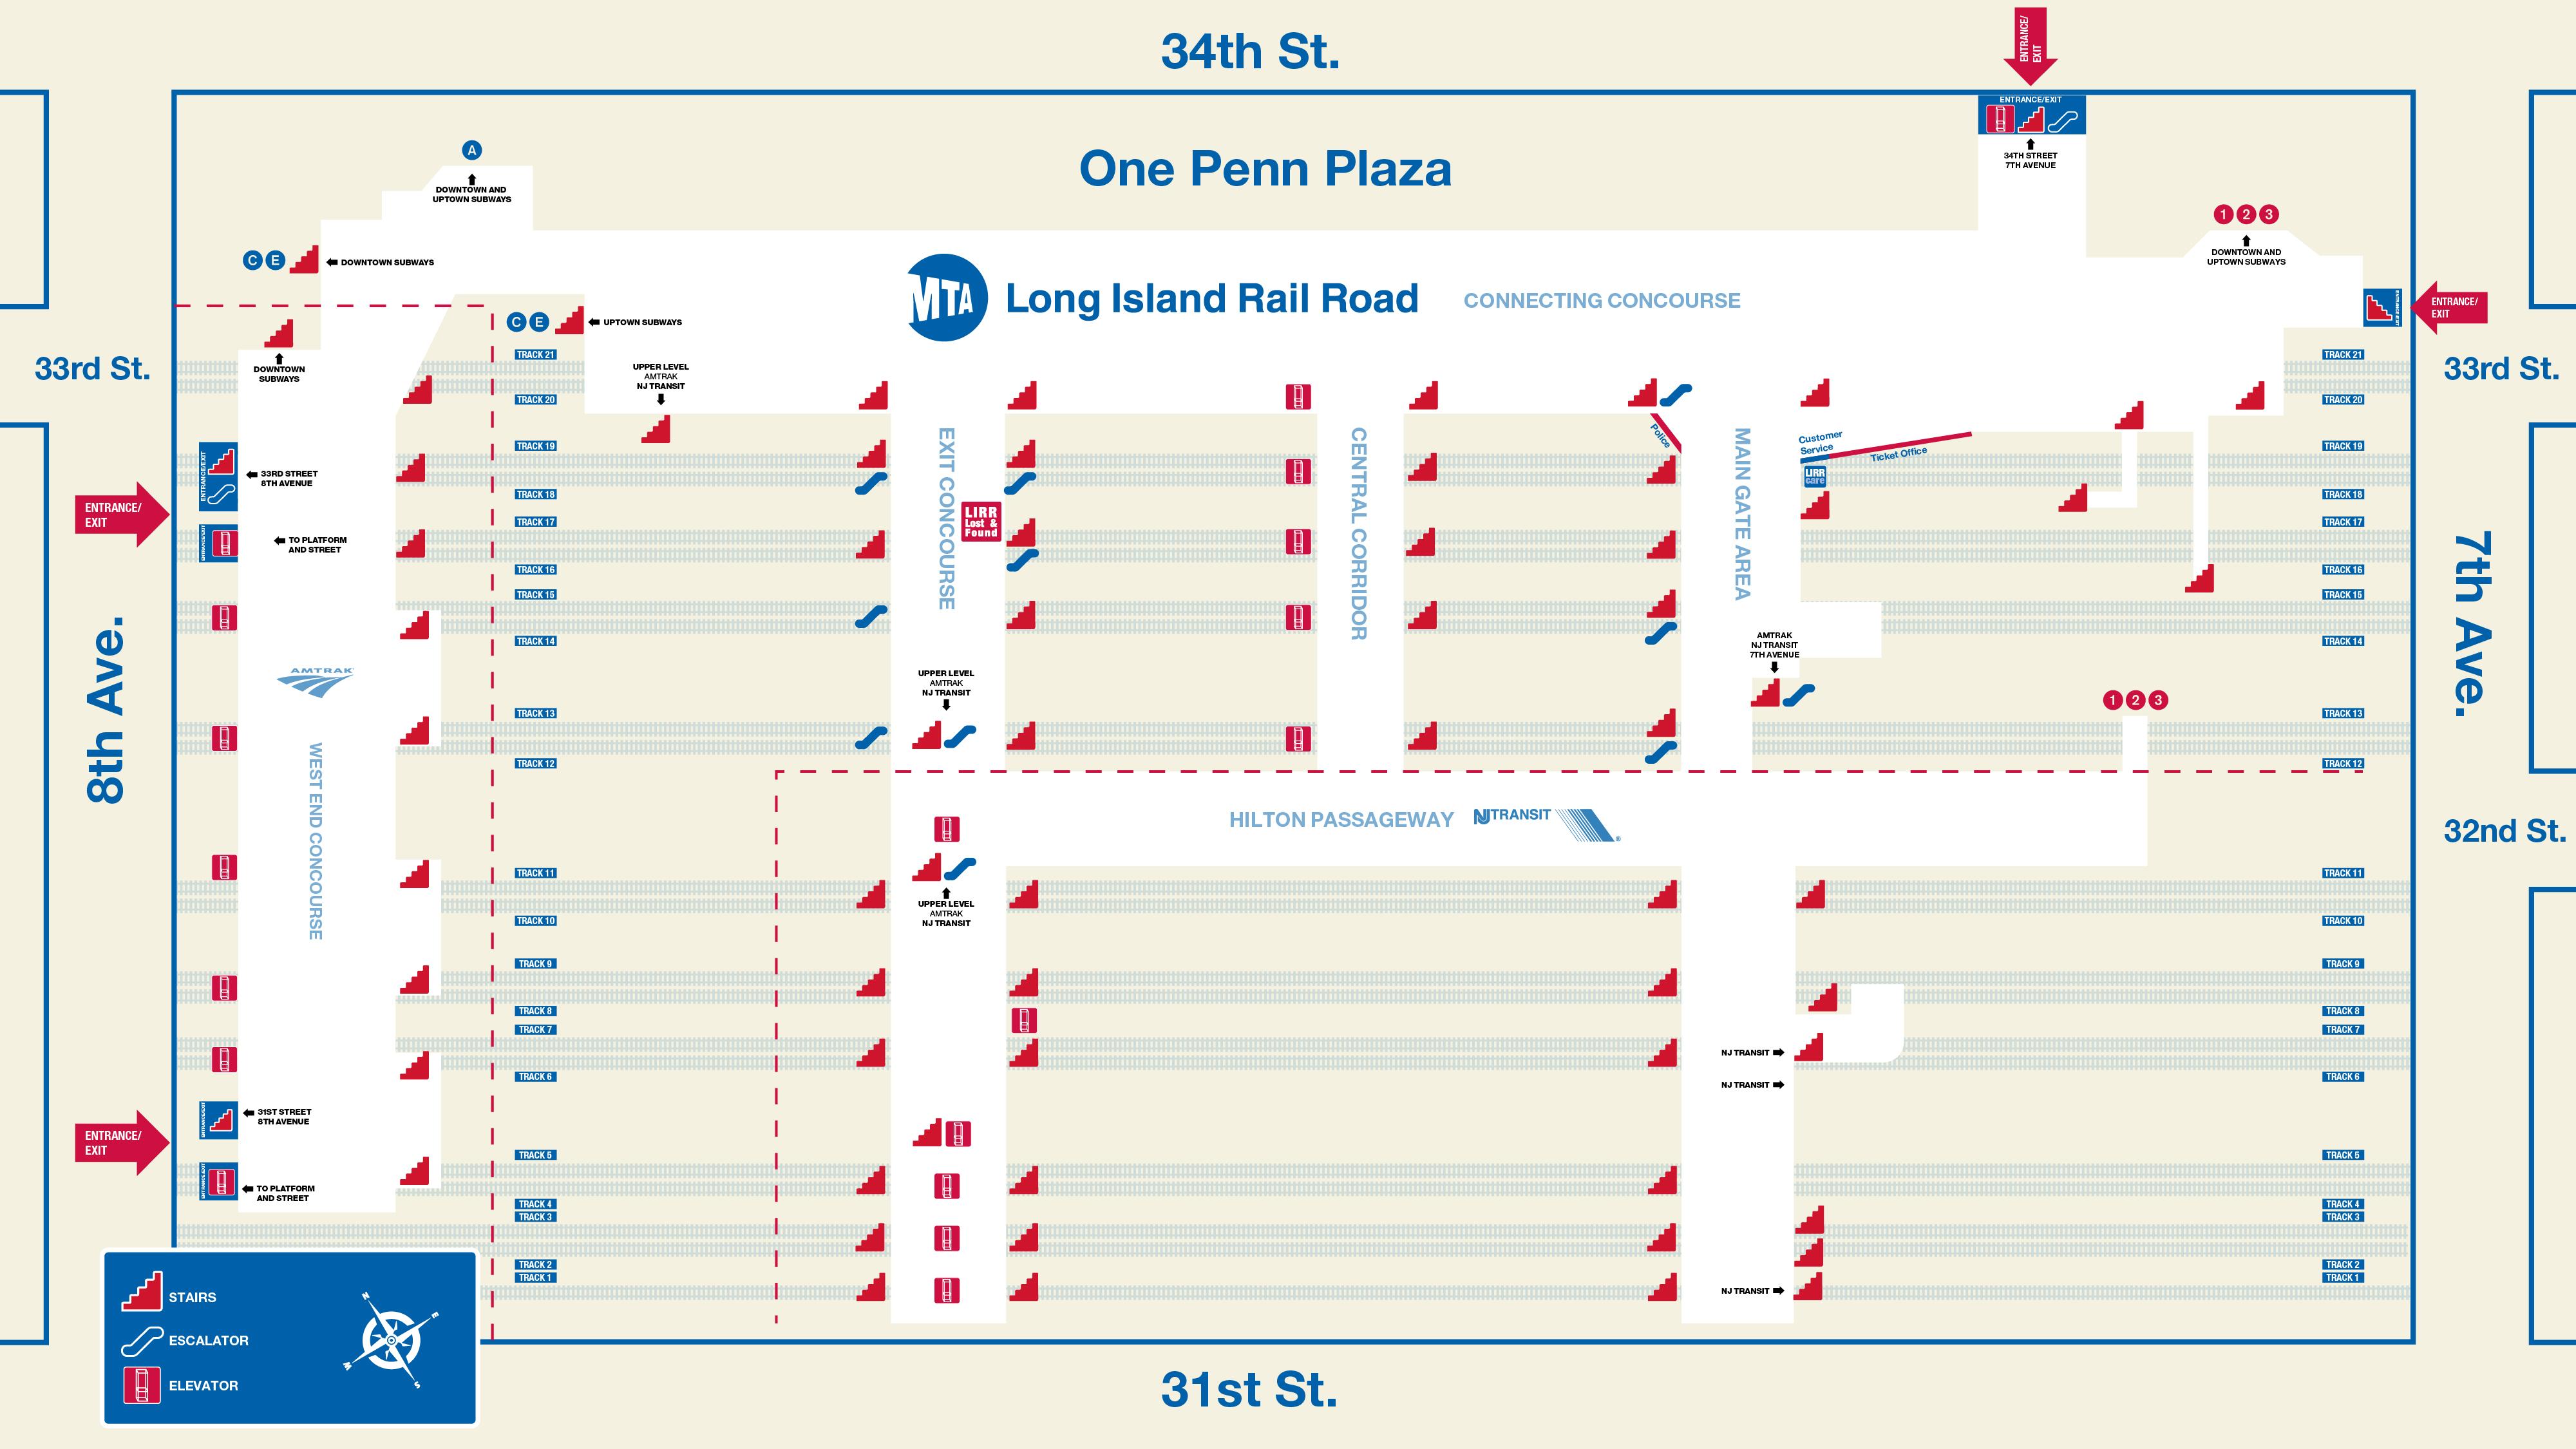 New York Subway Map Penn Station.Mta Lirr Penn Station Service